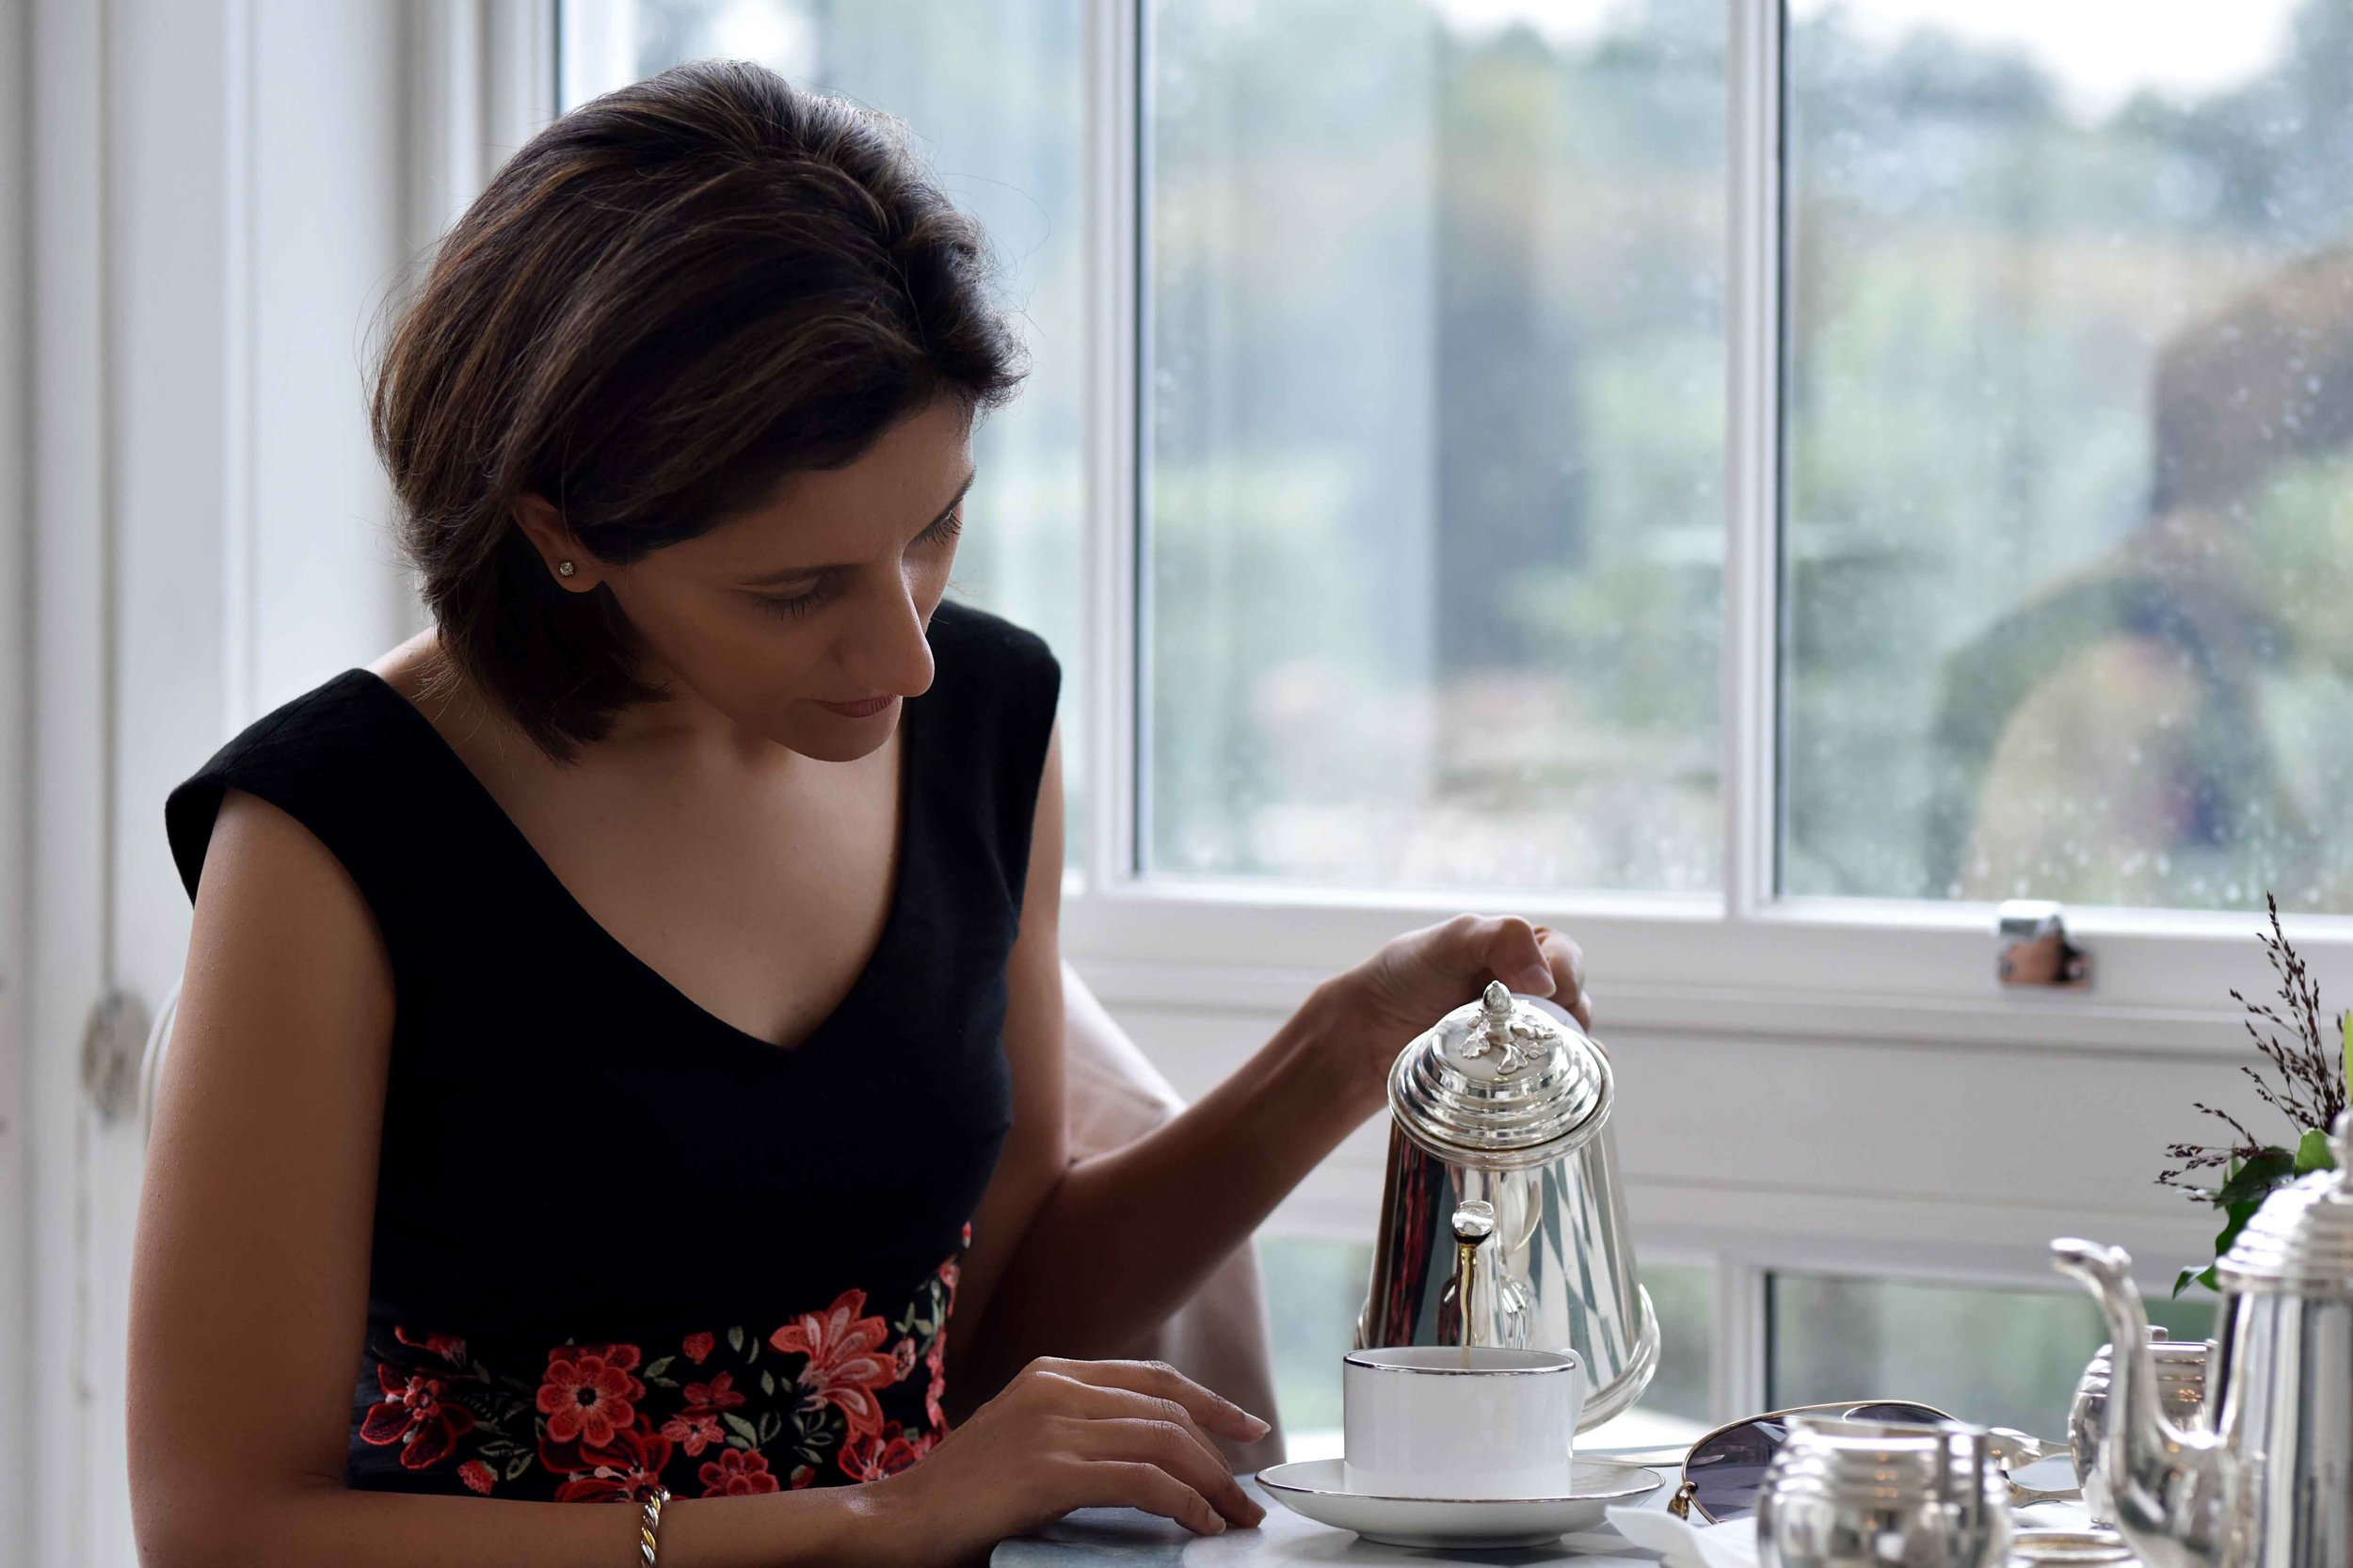 Black Karen Millen dress, high tea, afternoon tea, Coworth Park hotel and spa, Dorchester Collection, Ascot, UK. Image©sourcingstyle.com